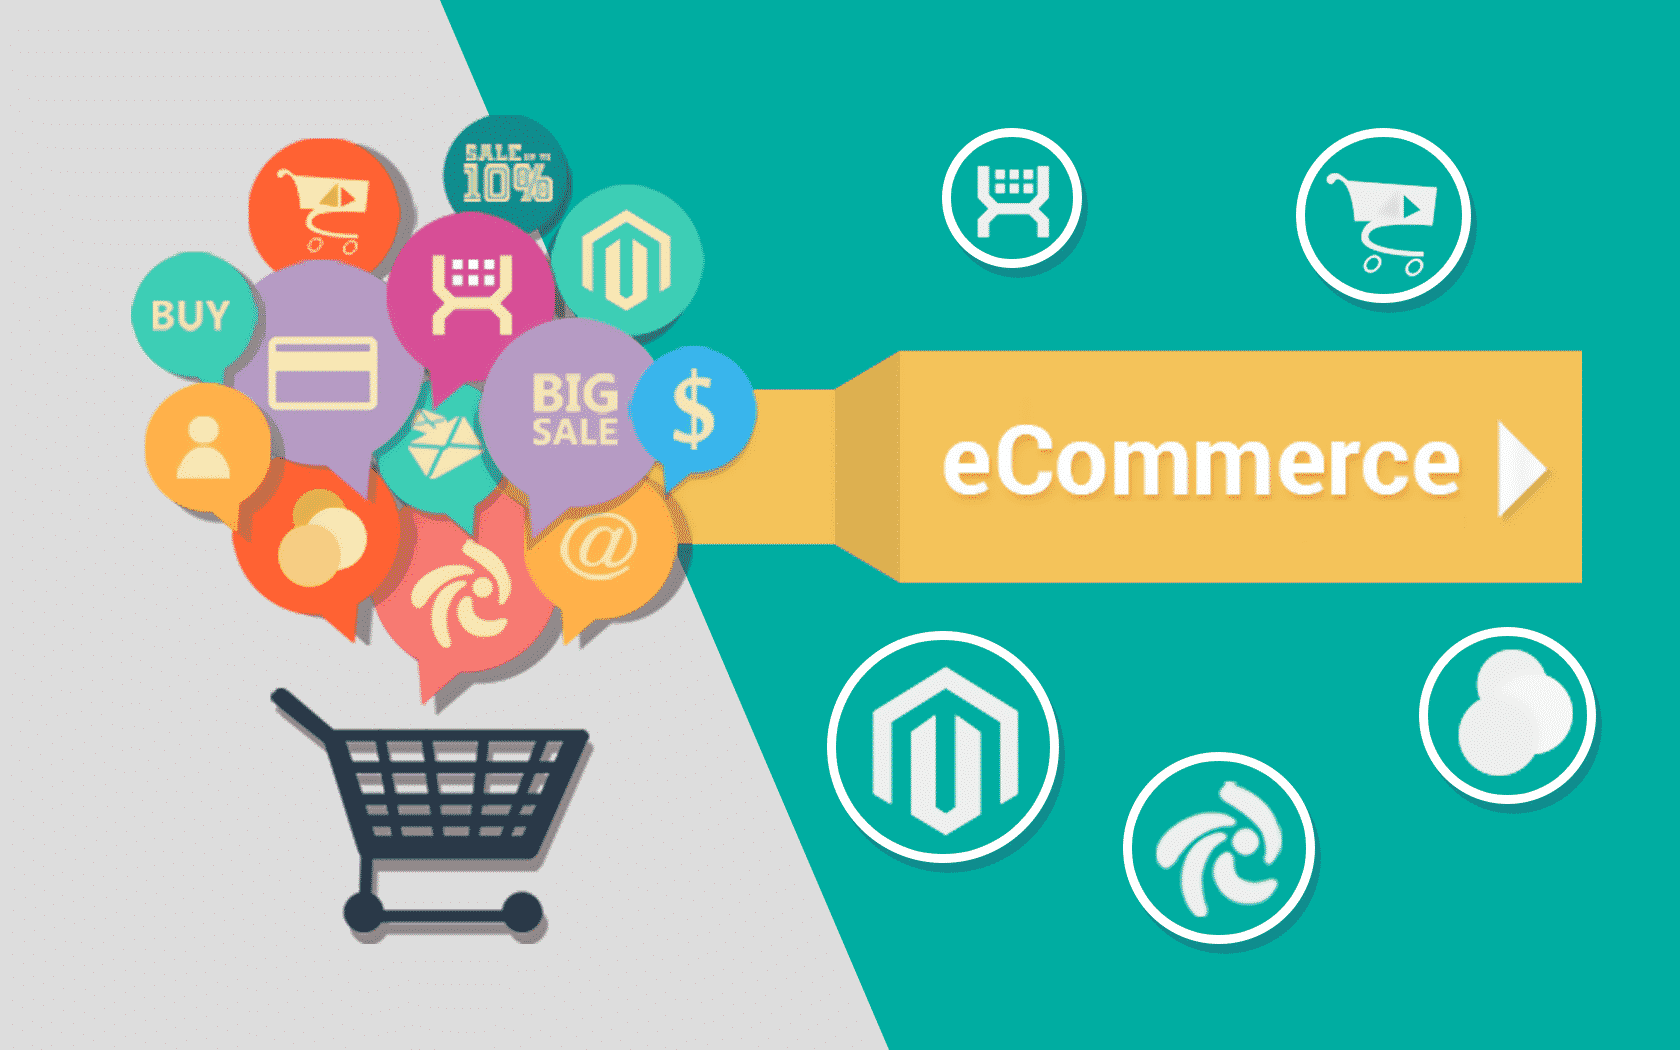 ecommerce, бизнес, интернет-маркетинг, реклама, стратегия